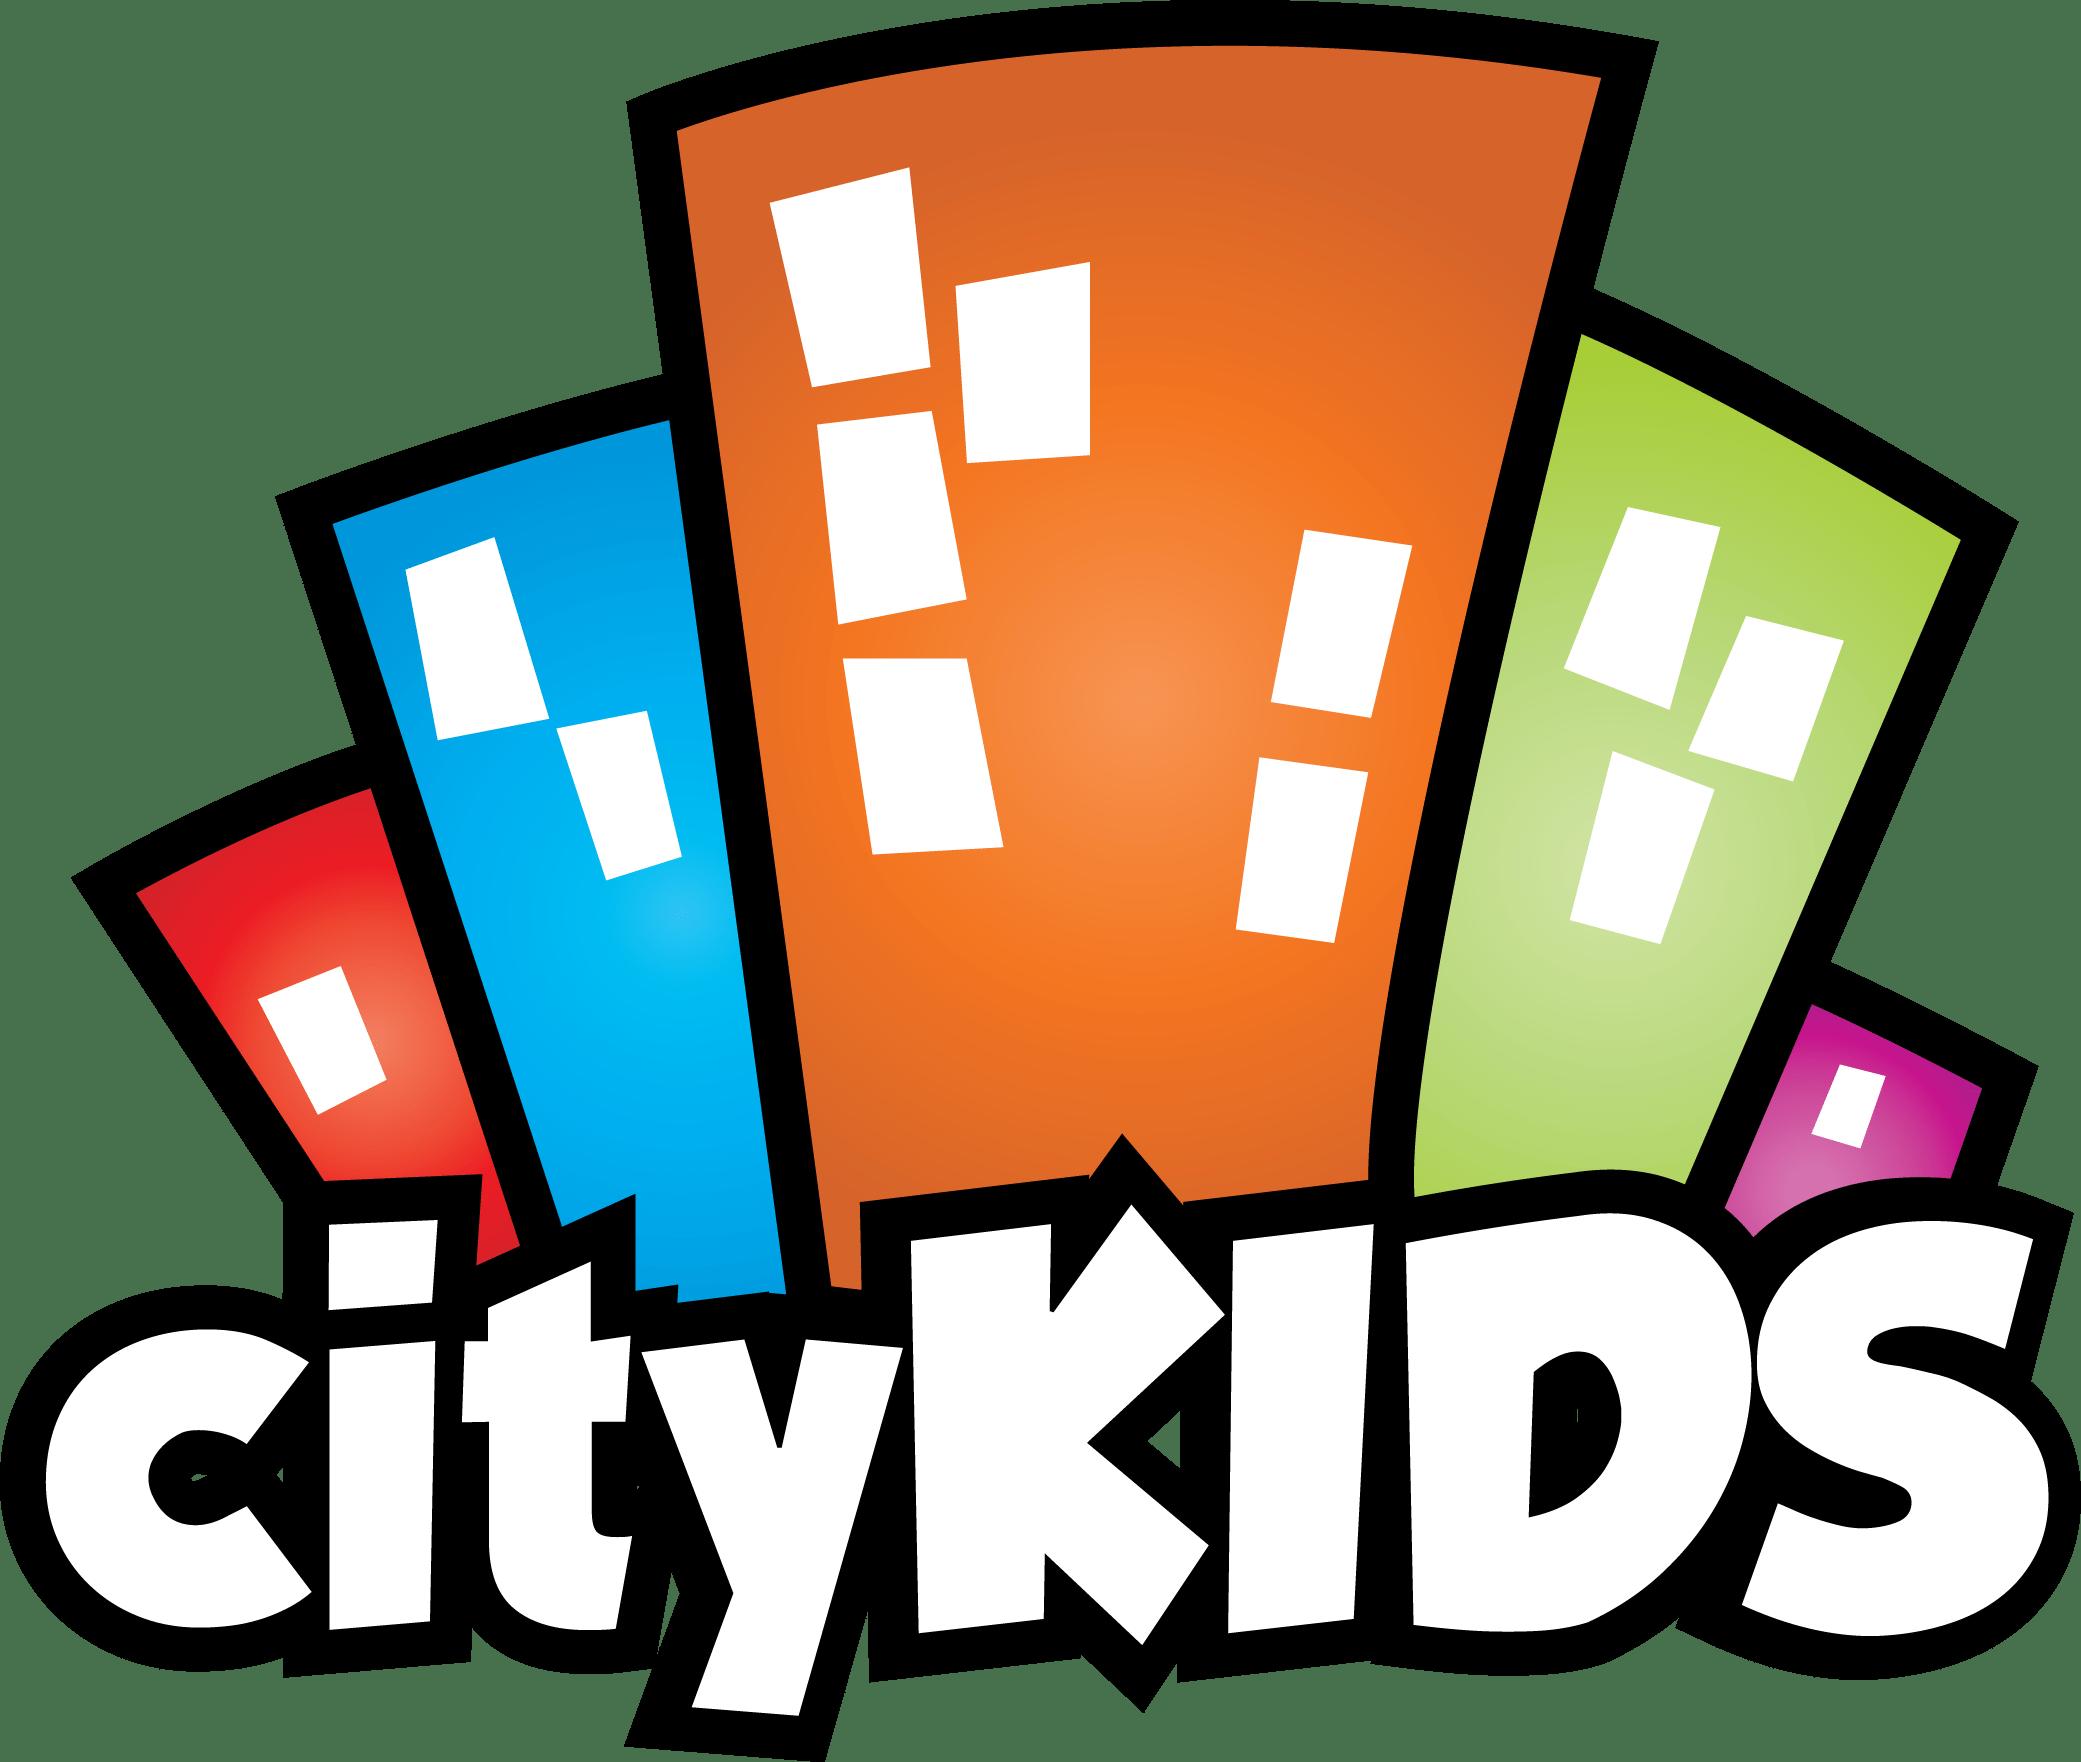 Kidz City - The Church Triumphant